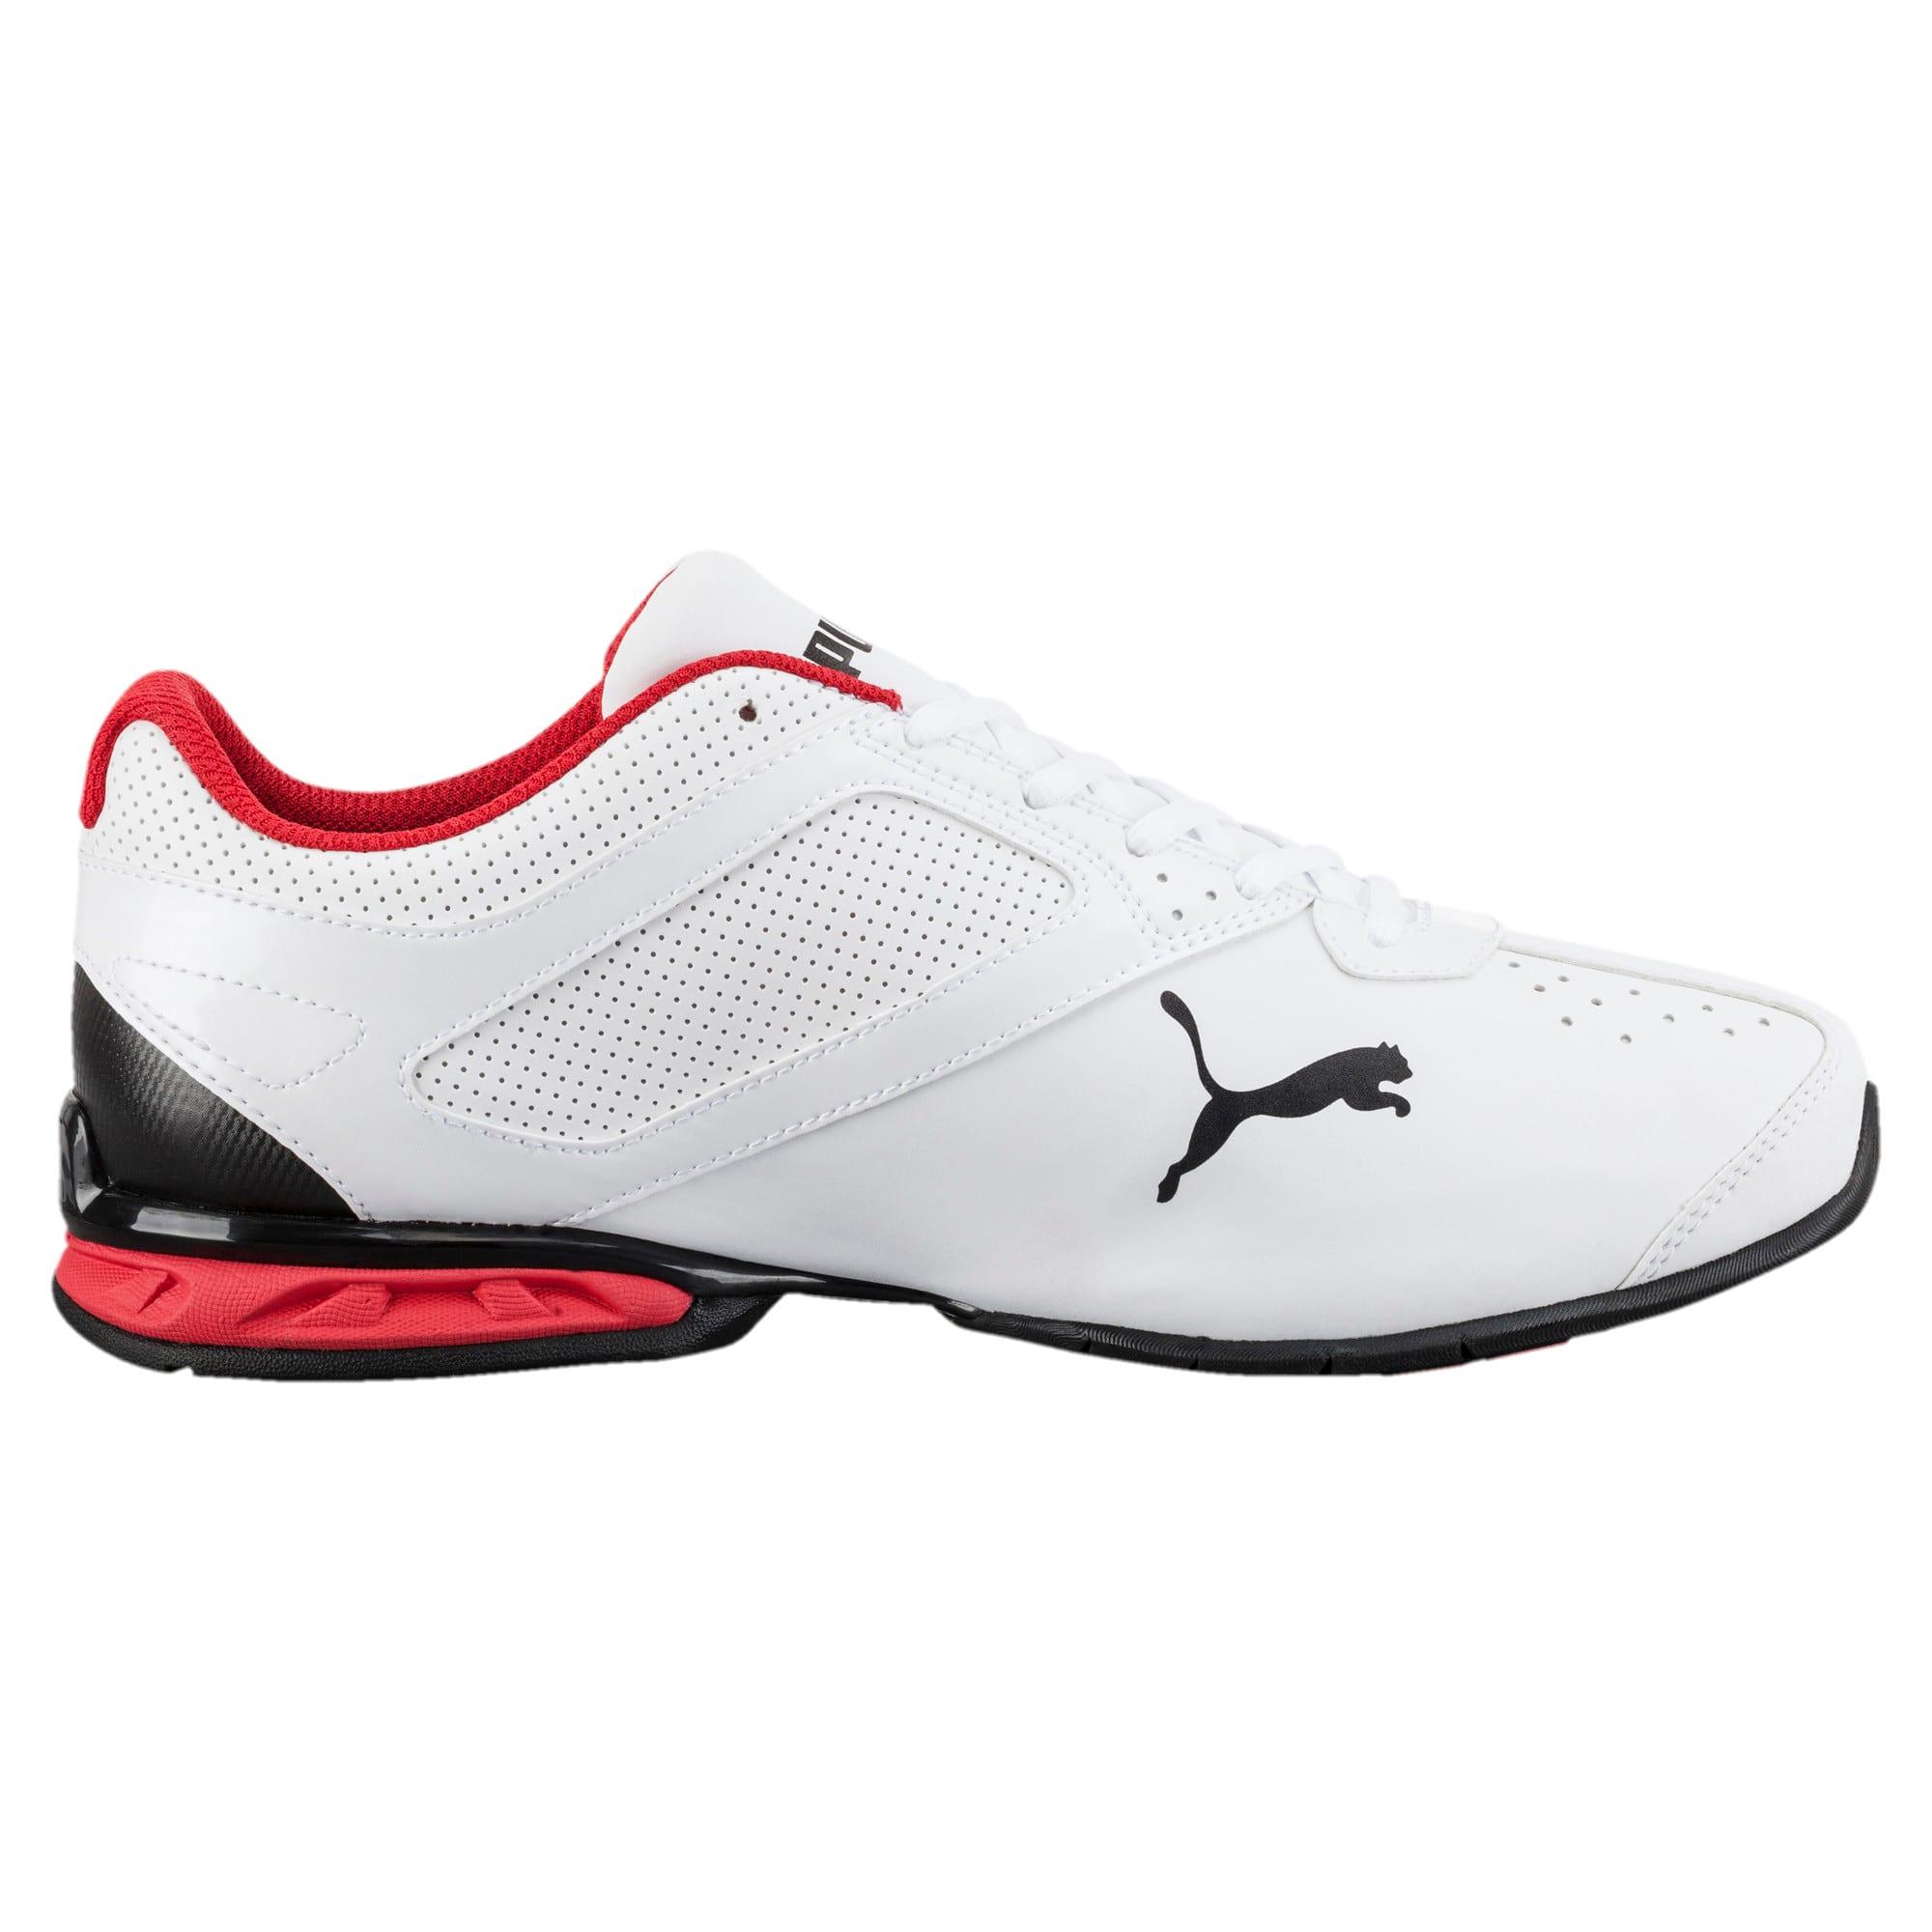 Thumbnail 3 of Tazon 6 FM Wide Men's Sneakers, White-Black-puma silver, medium